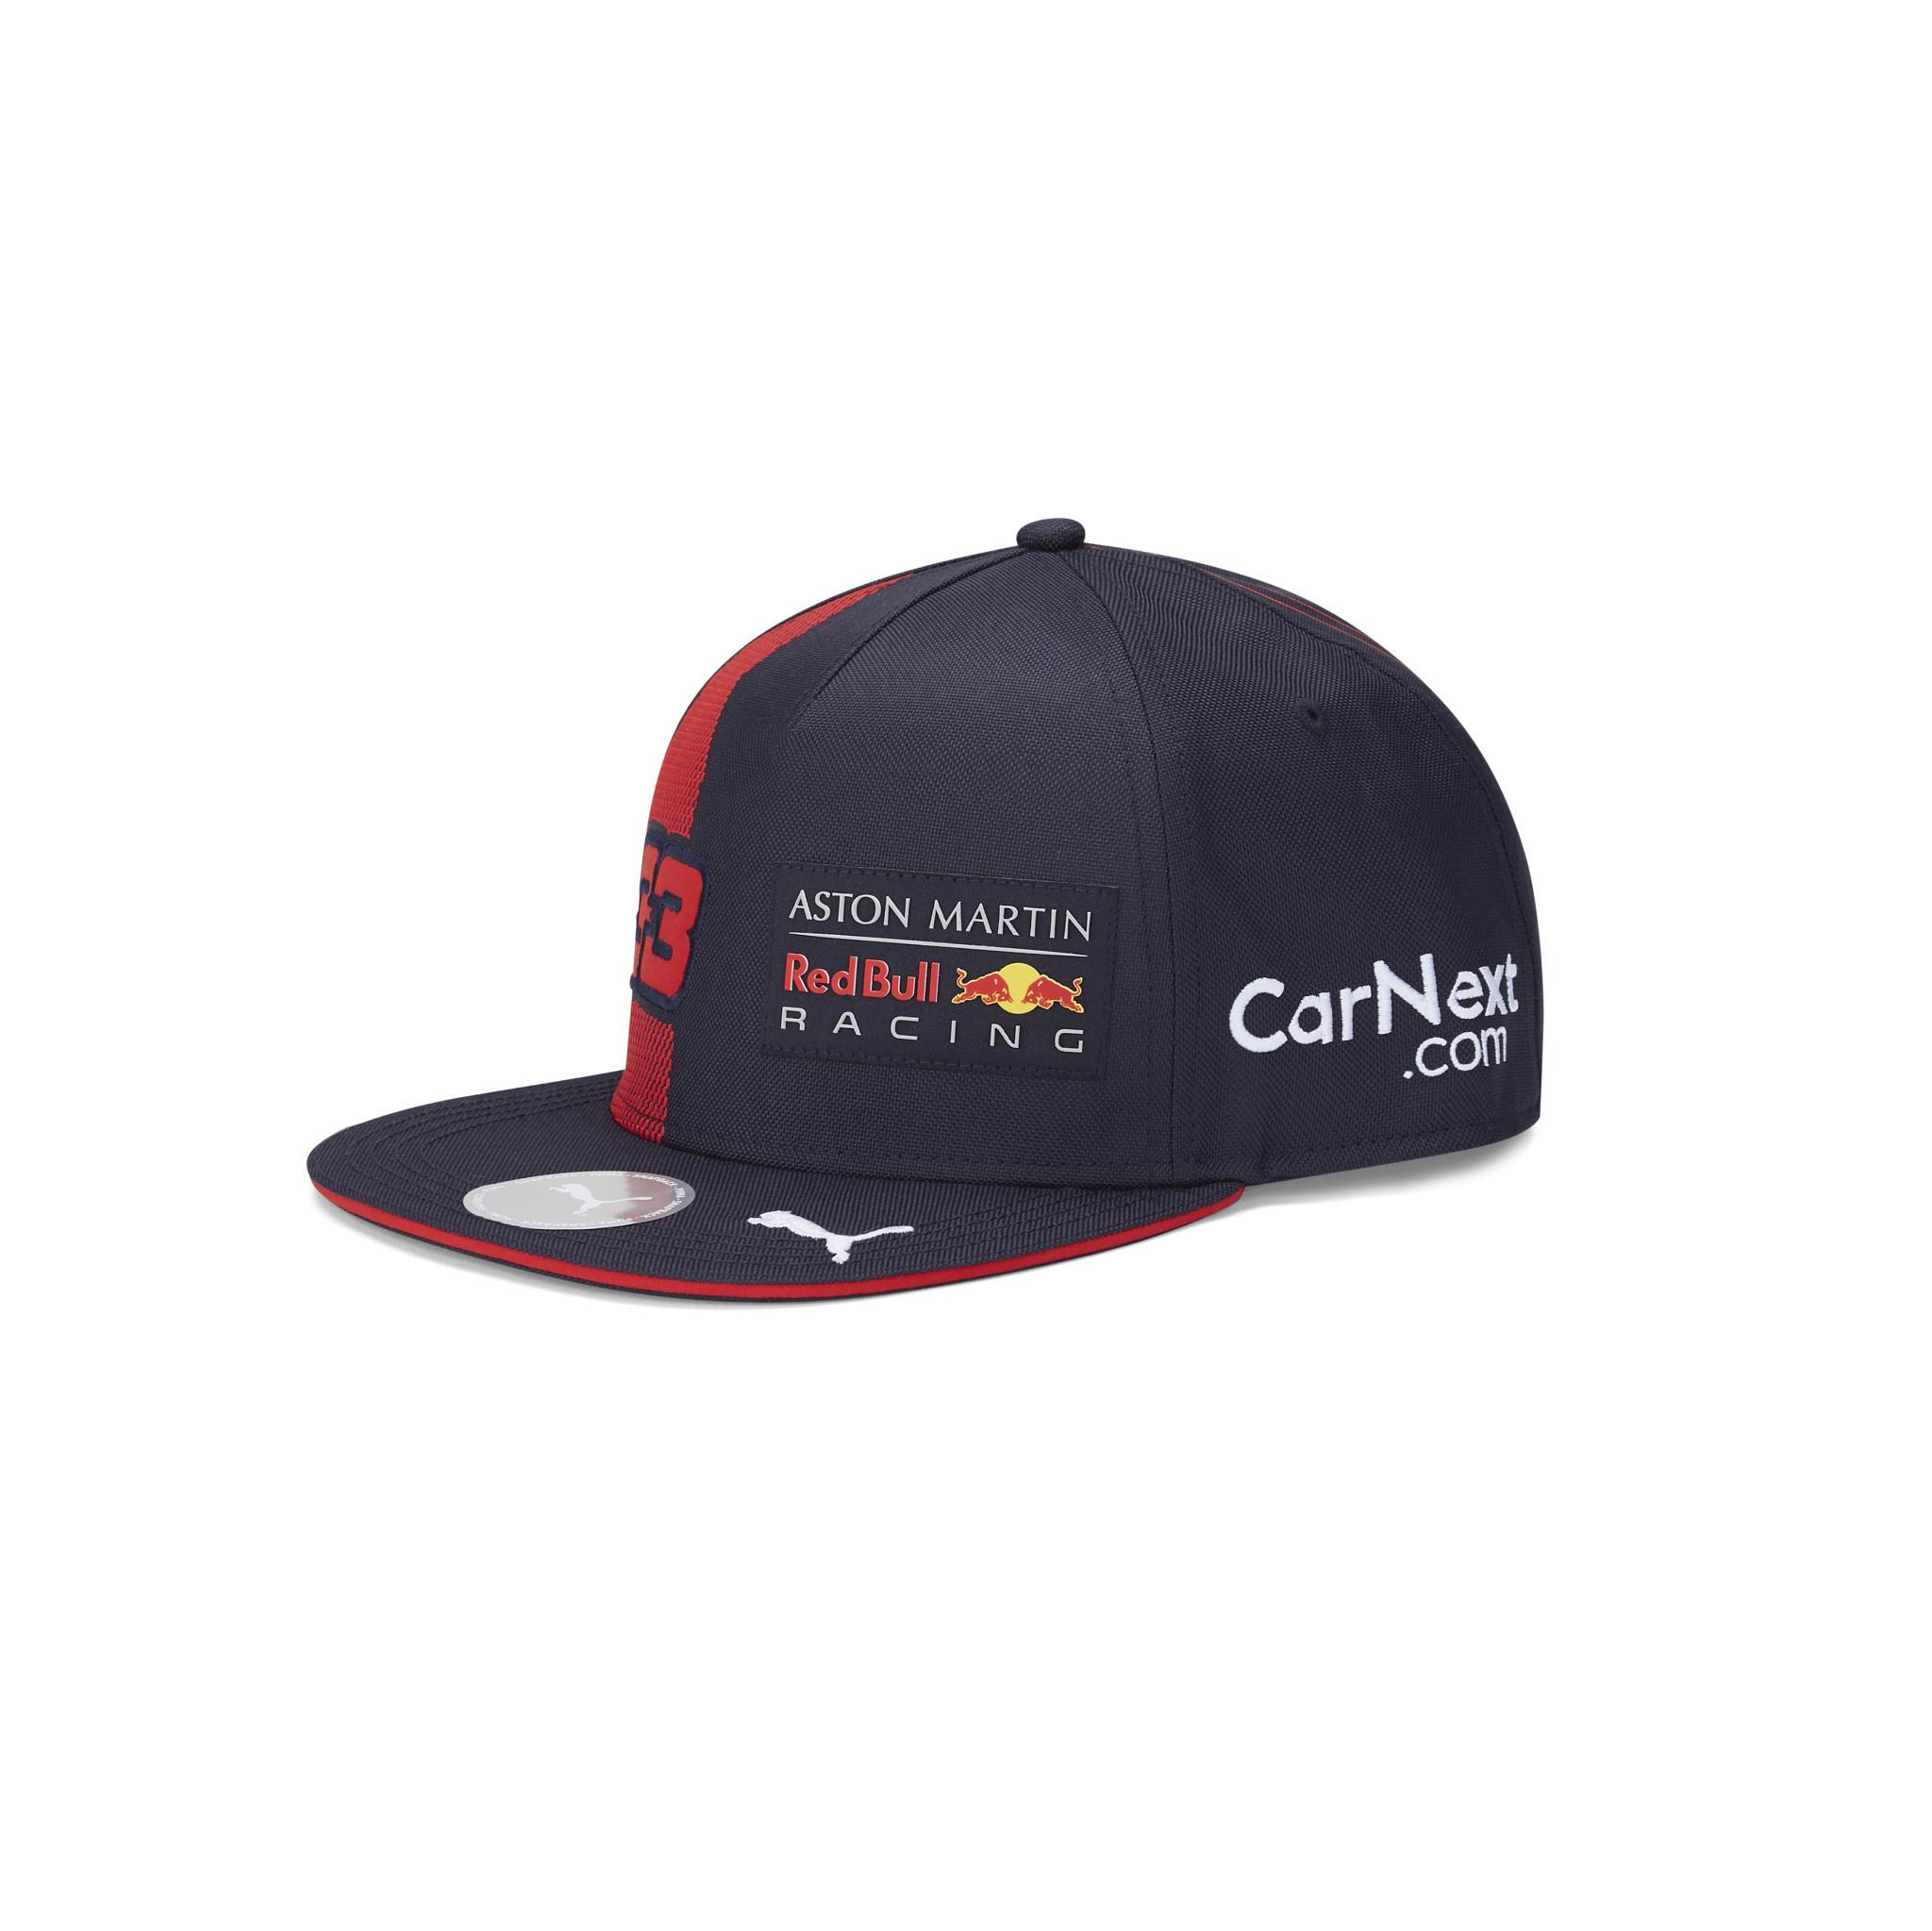 Red Bull Racing Max Verstappen Cap 2020